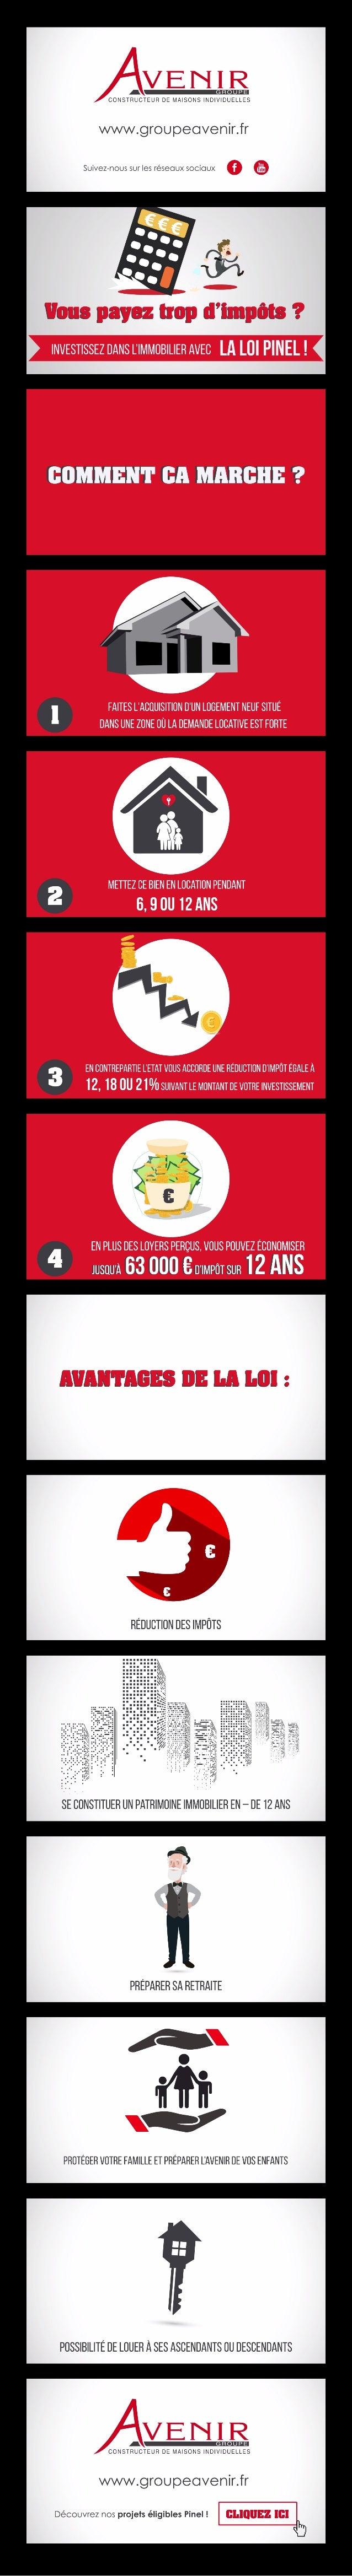 Programme Investisseur Groupe Avenir